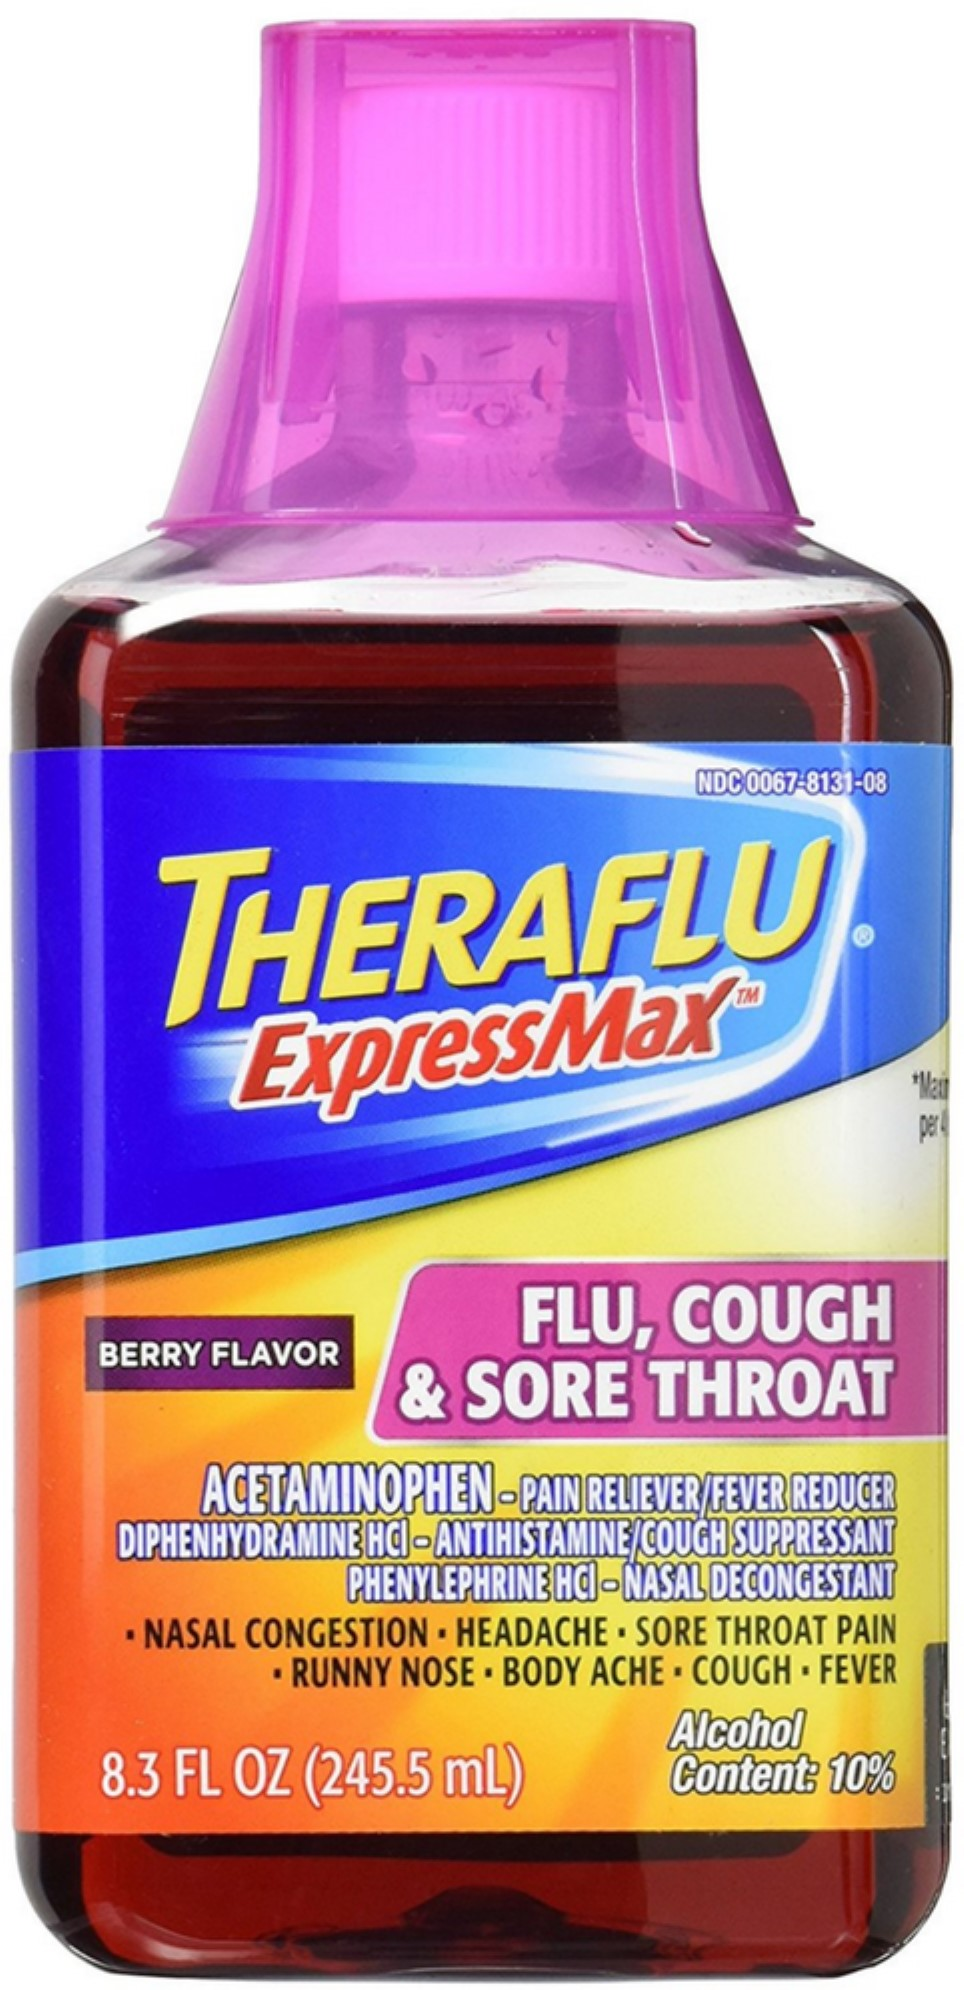 Theraflu Expressmax Flu Cough Sore Throat Syrup Berry Flavor 8 30 Oz Walmart Com